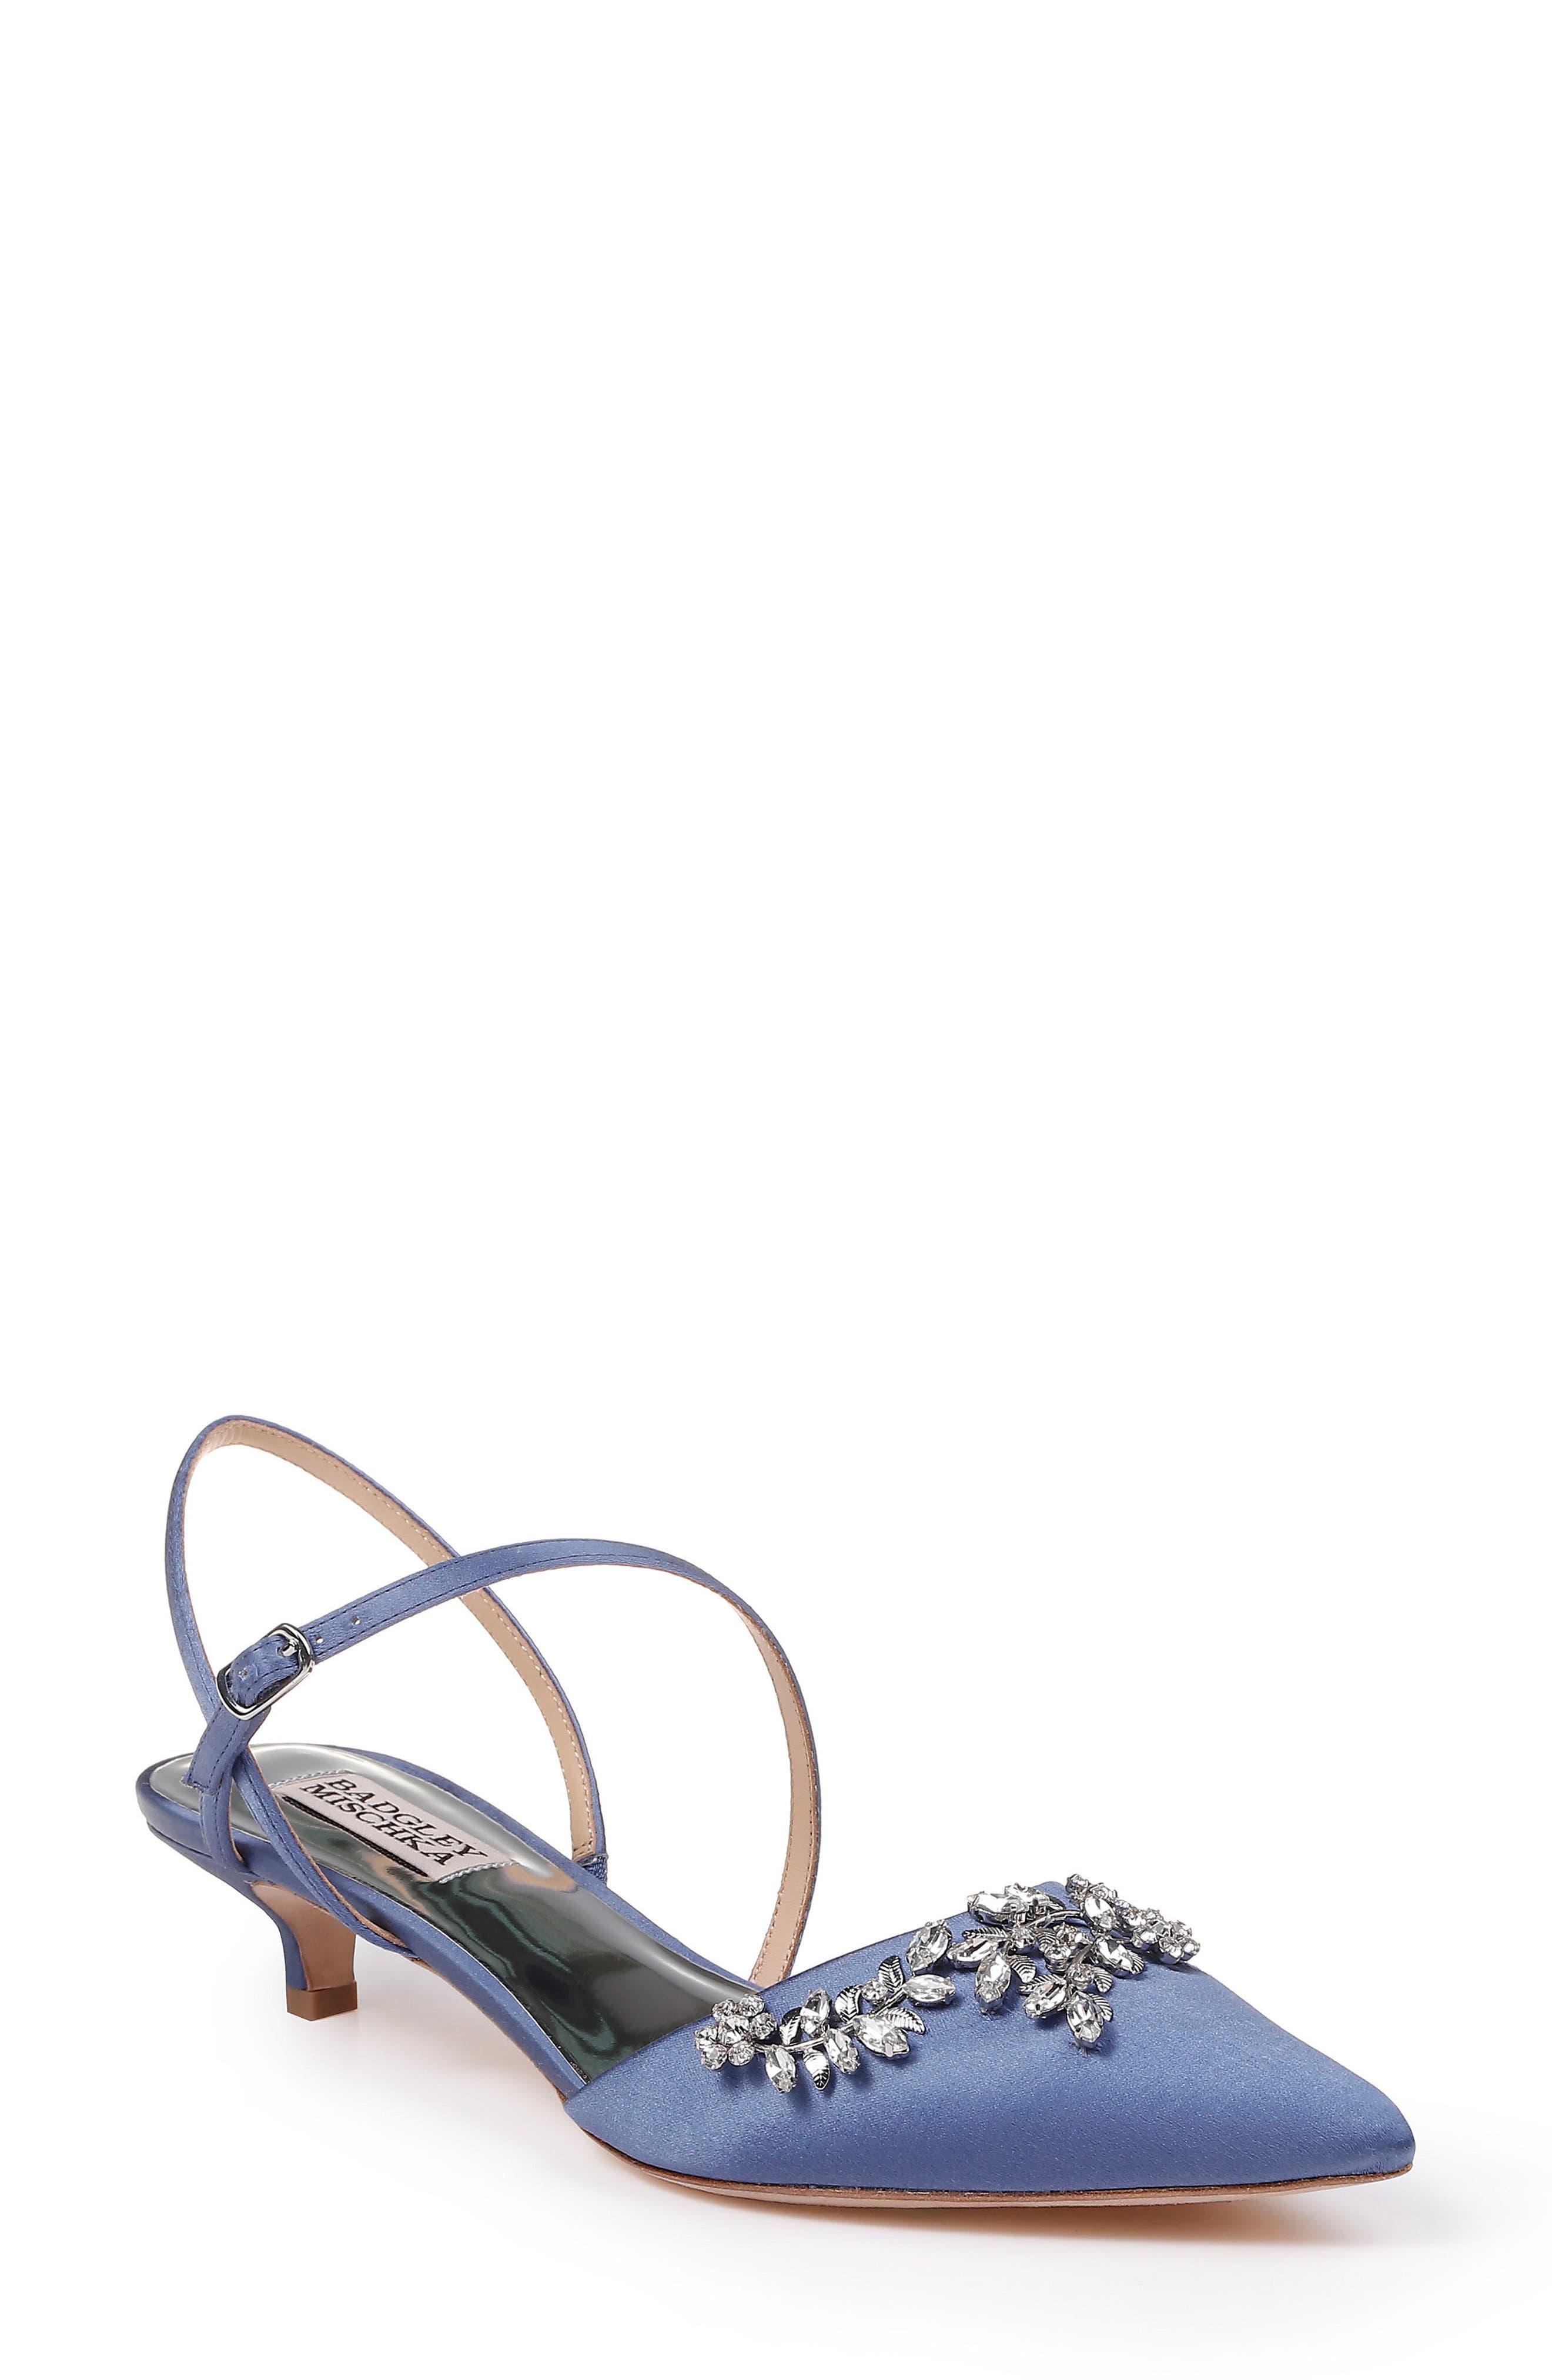 Badgley Mischka Crystal Embellished Quarter Strap Pump, Main, color, ITALIAN BLUE SATIN